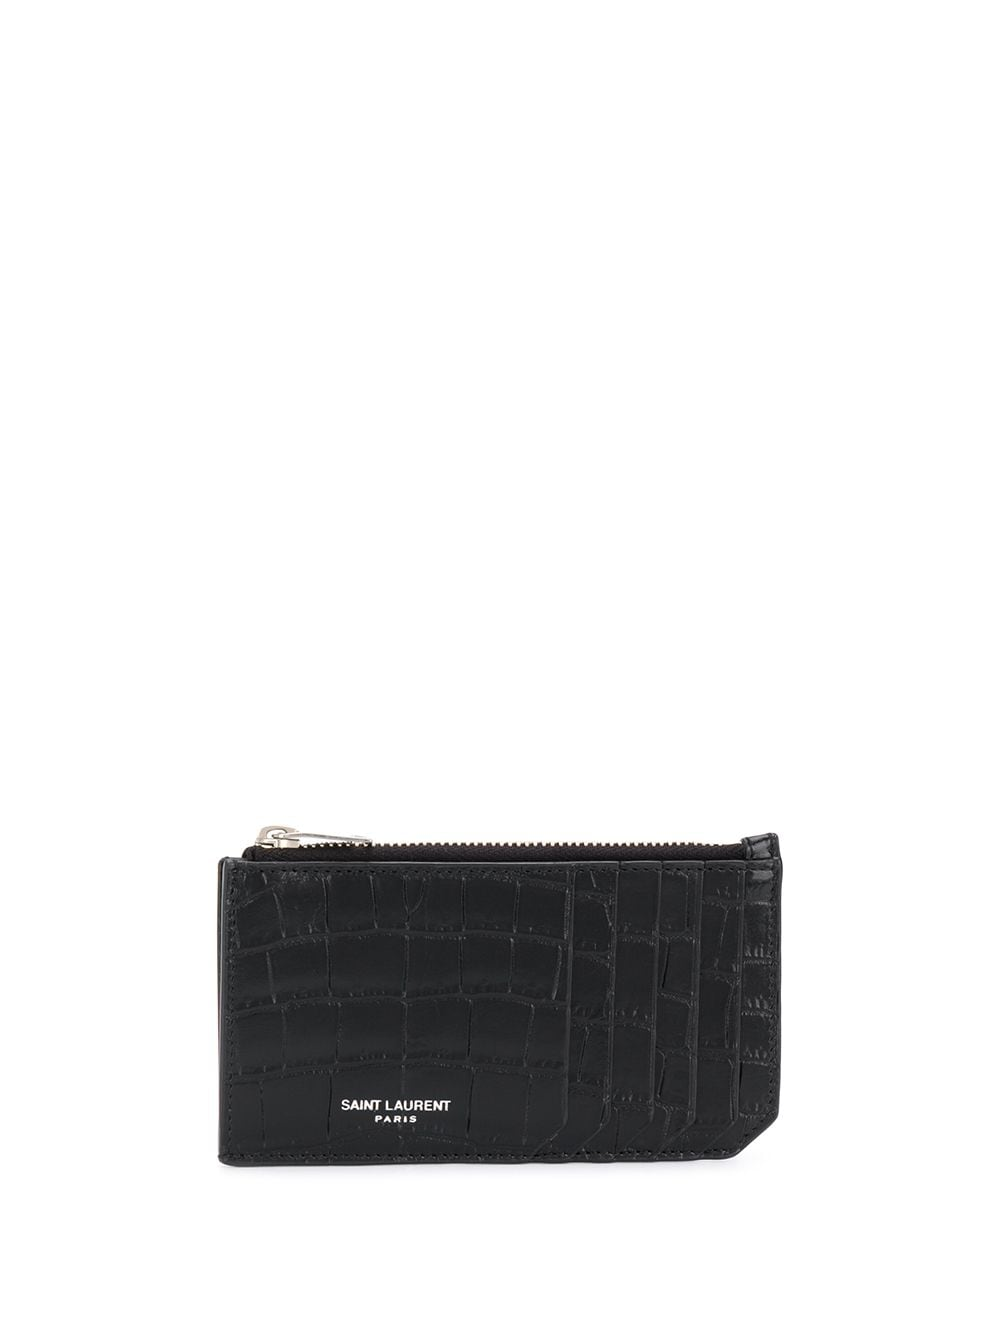 Leather Card Case Holder